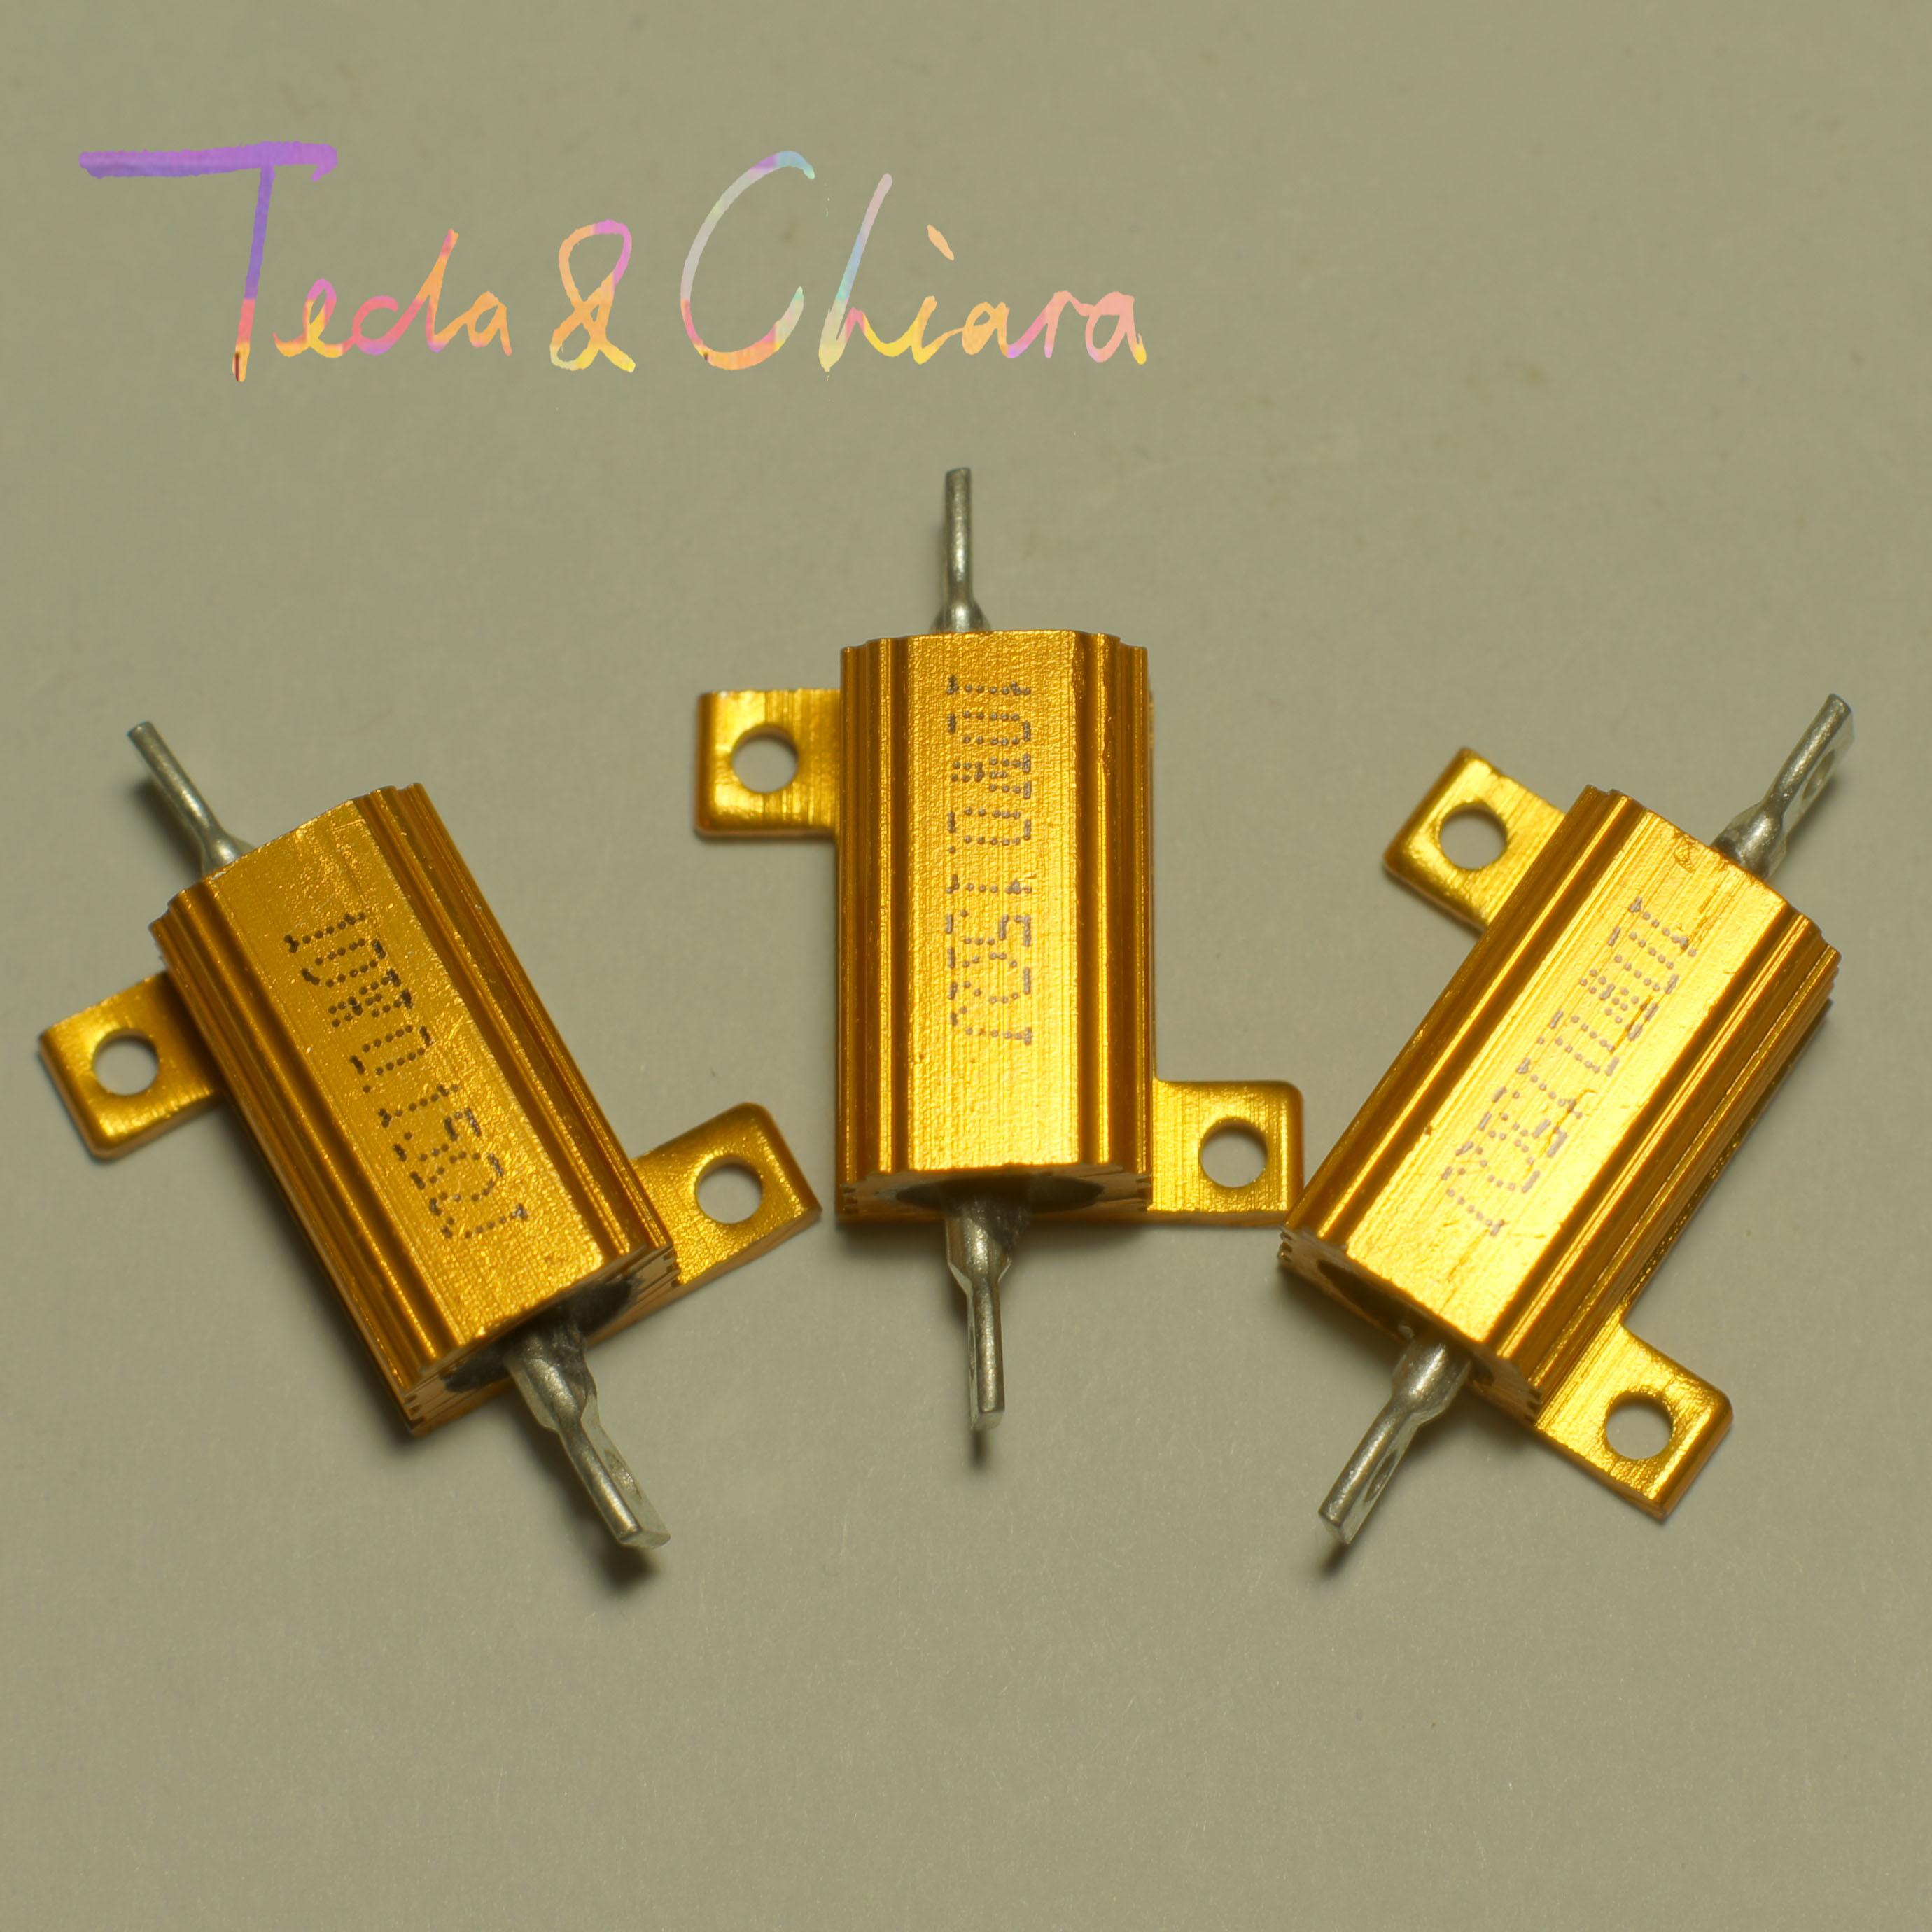 150R 150 150ohm 18R 18 18ohm R Ohm 10W Watt Gold Tone Wirewound Aluminum Power Metal Shell Case Resistance Resistor RX24